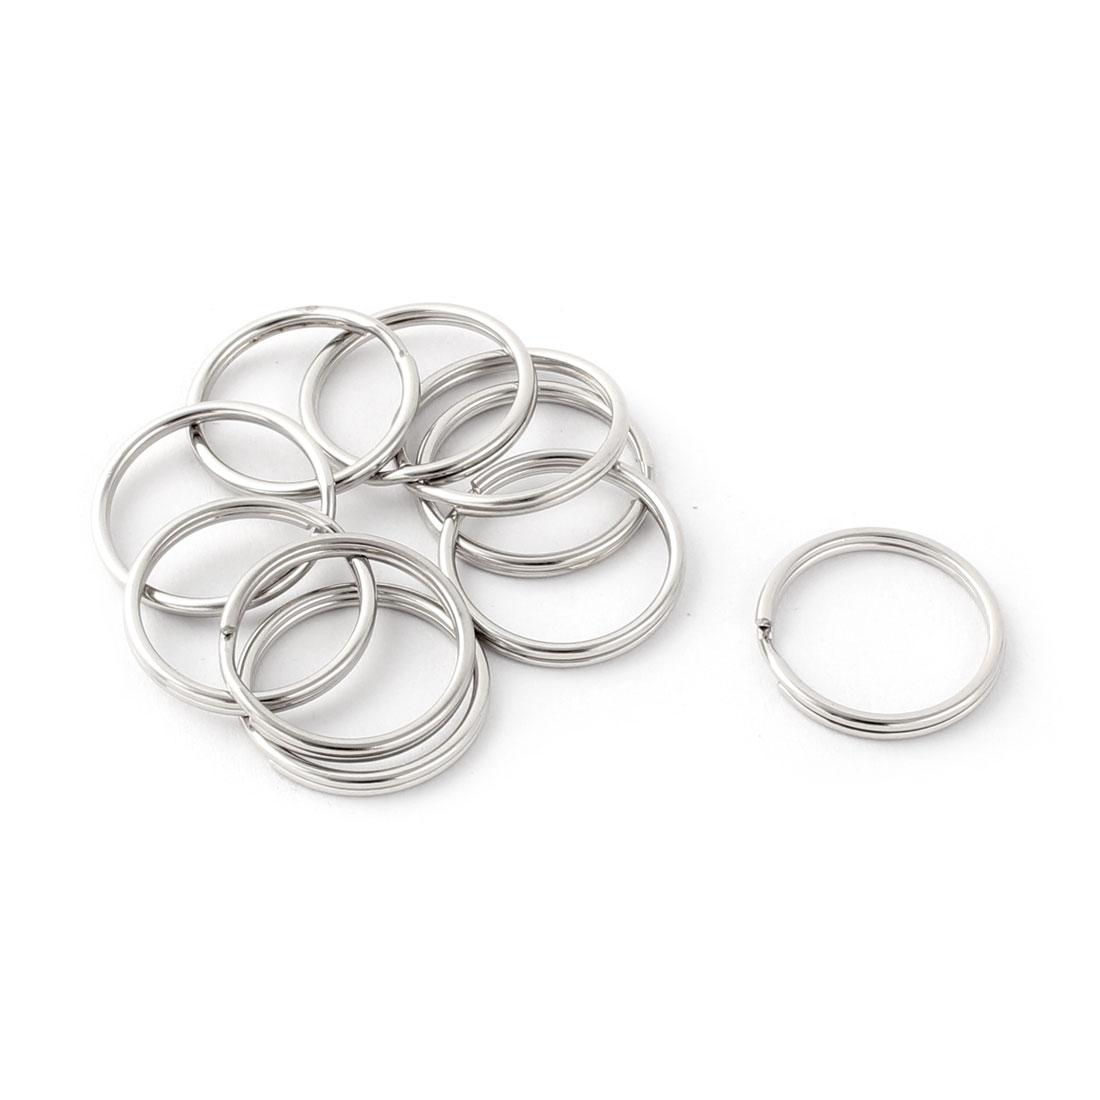 Metal Free DIY Keys Ring Chain Key Split Loop Holder Silver Tone 20mm Diameter 10 Pcs